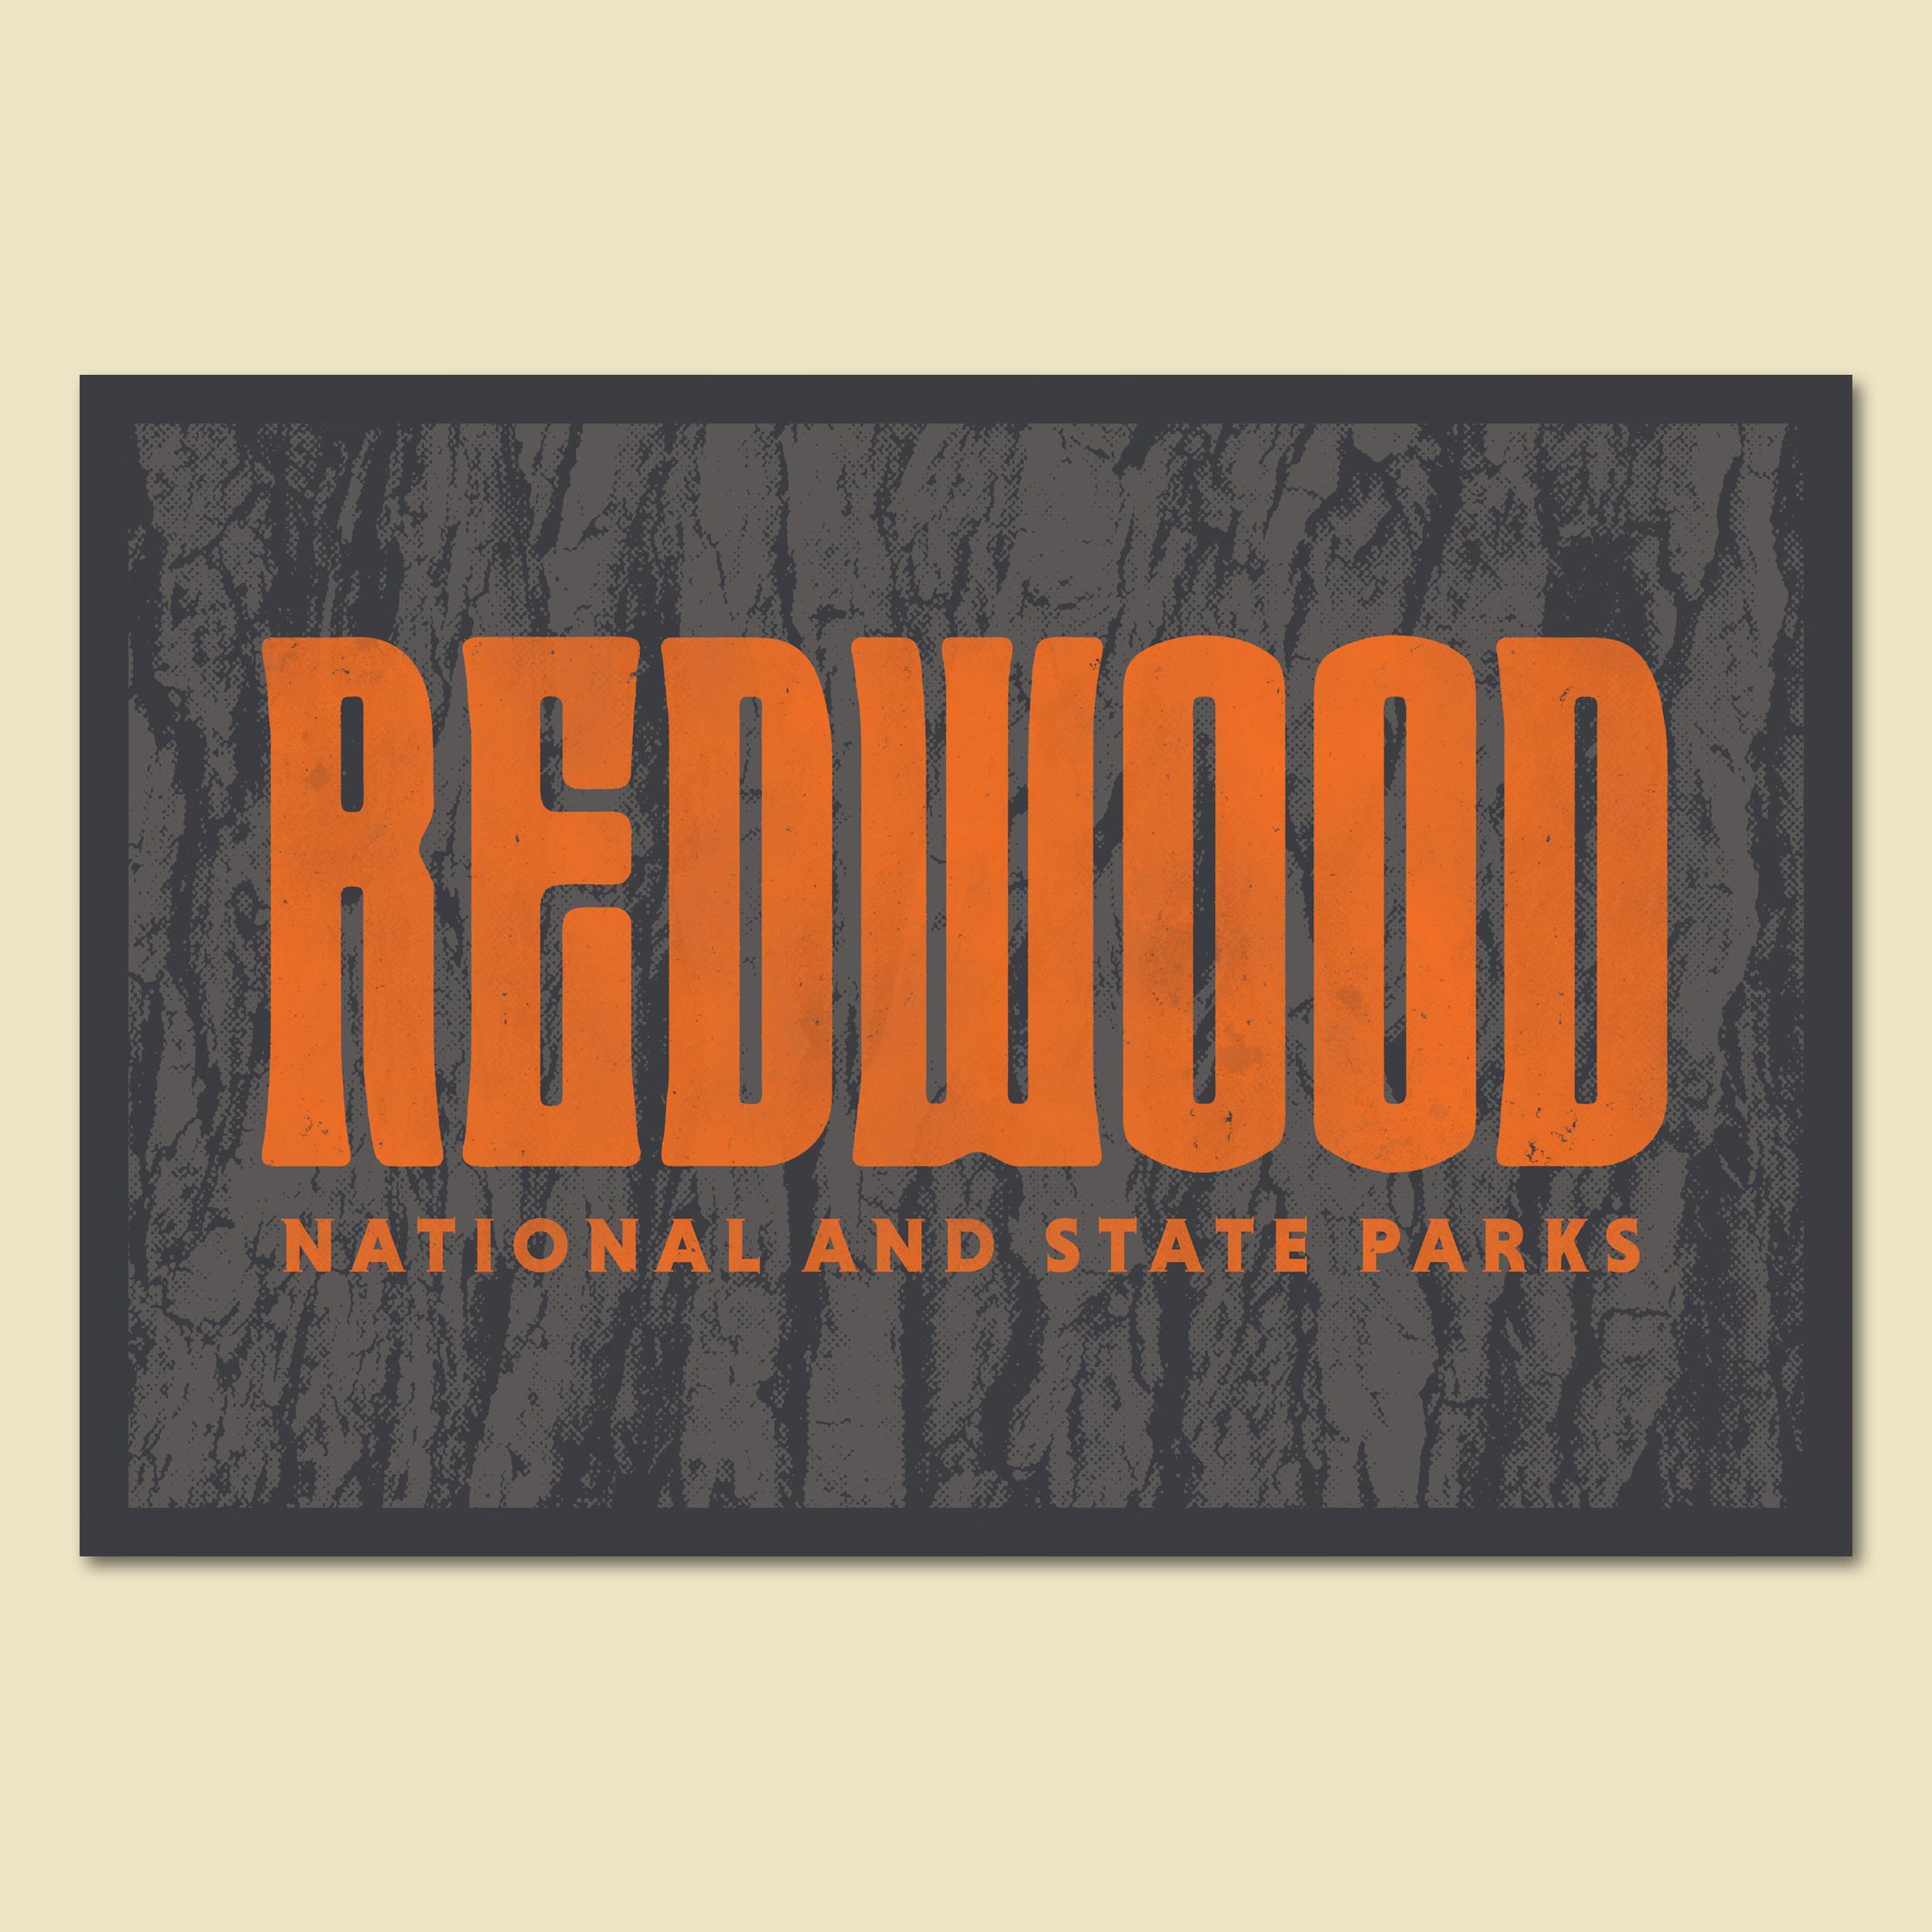 Redwood_Screen_Sq.jpg